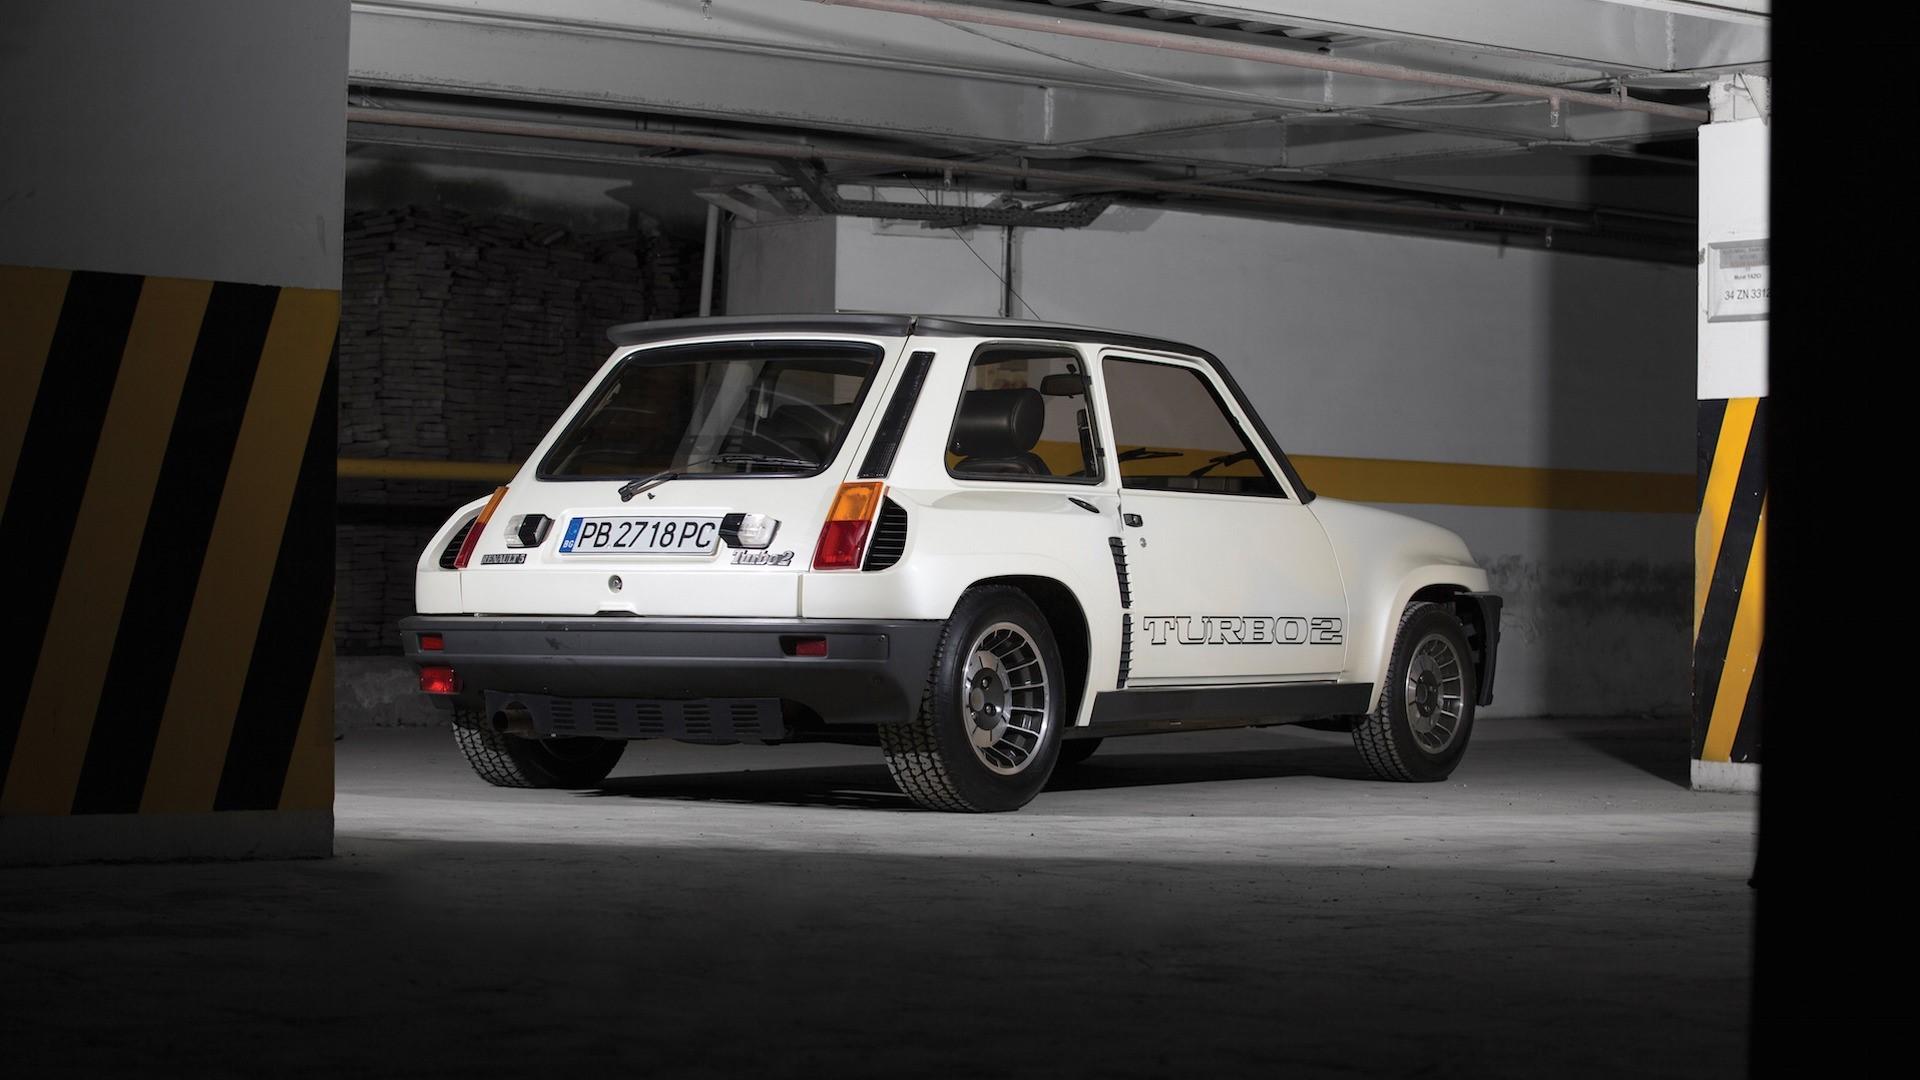 1983-renault-5-turbo-ii-auction (2)